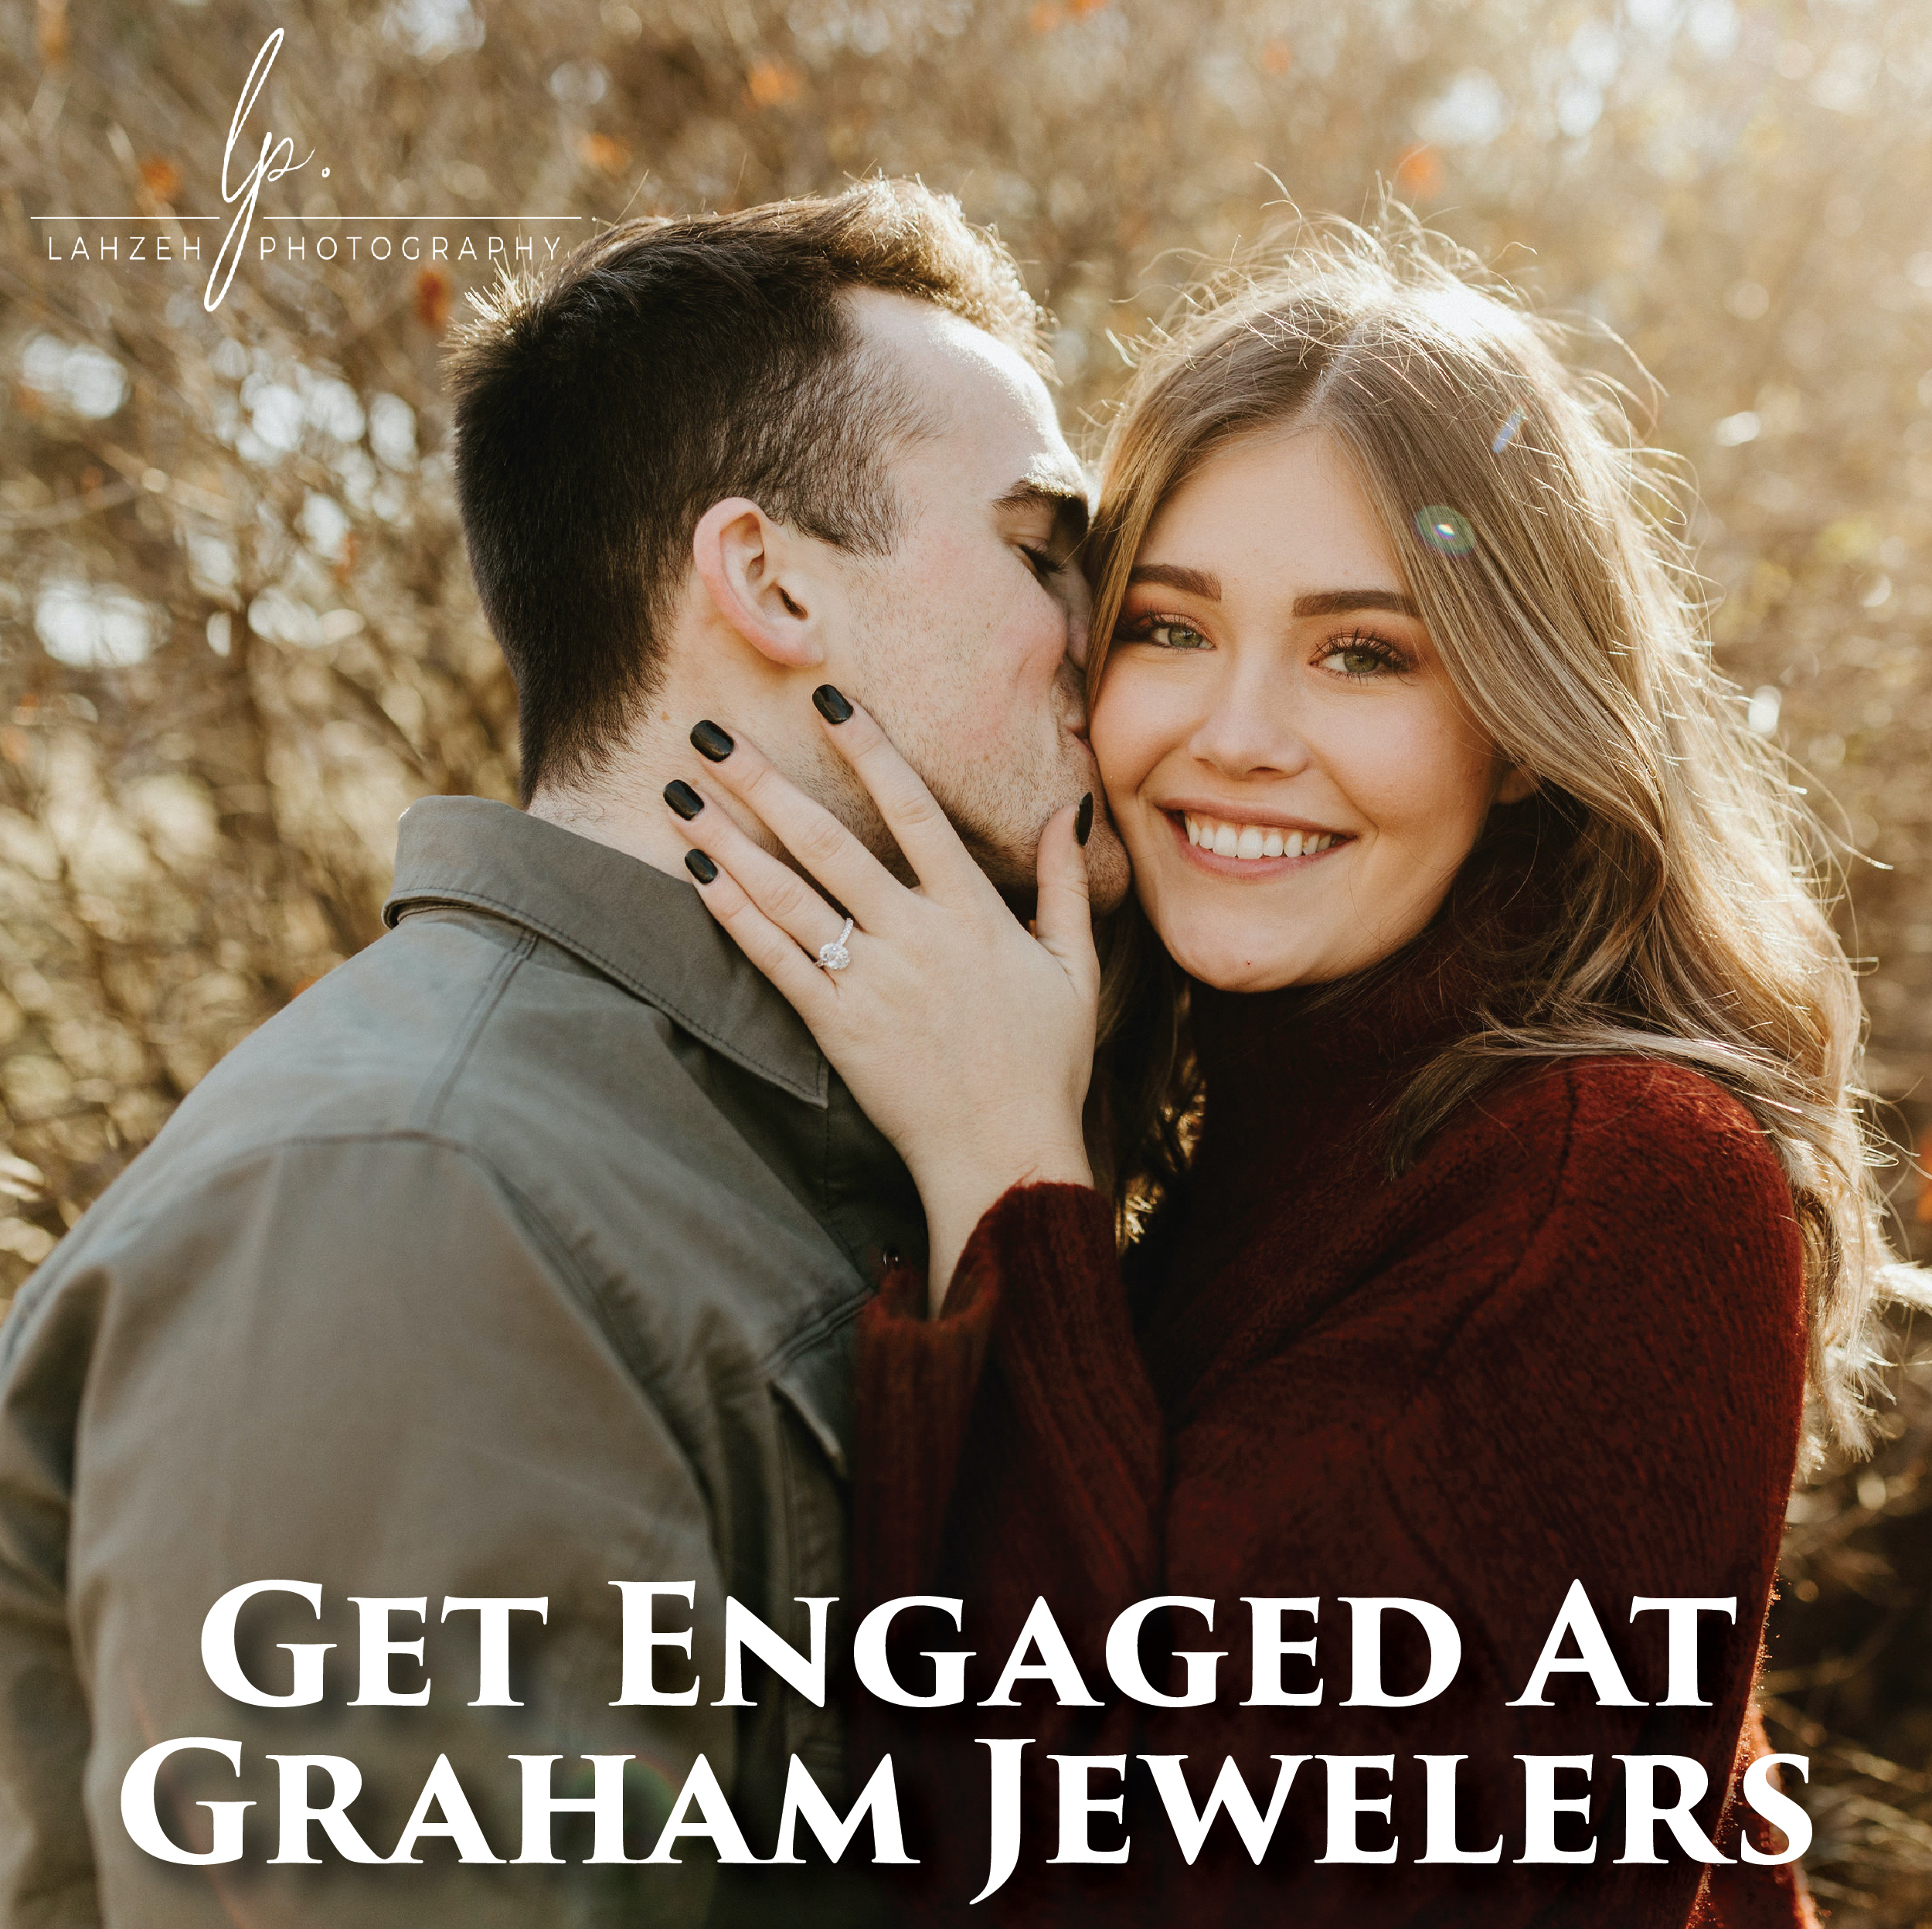 Get Engaged At Graham Jewelers  Graham Jewelers Wayzata, MN